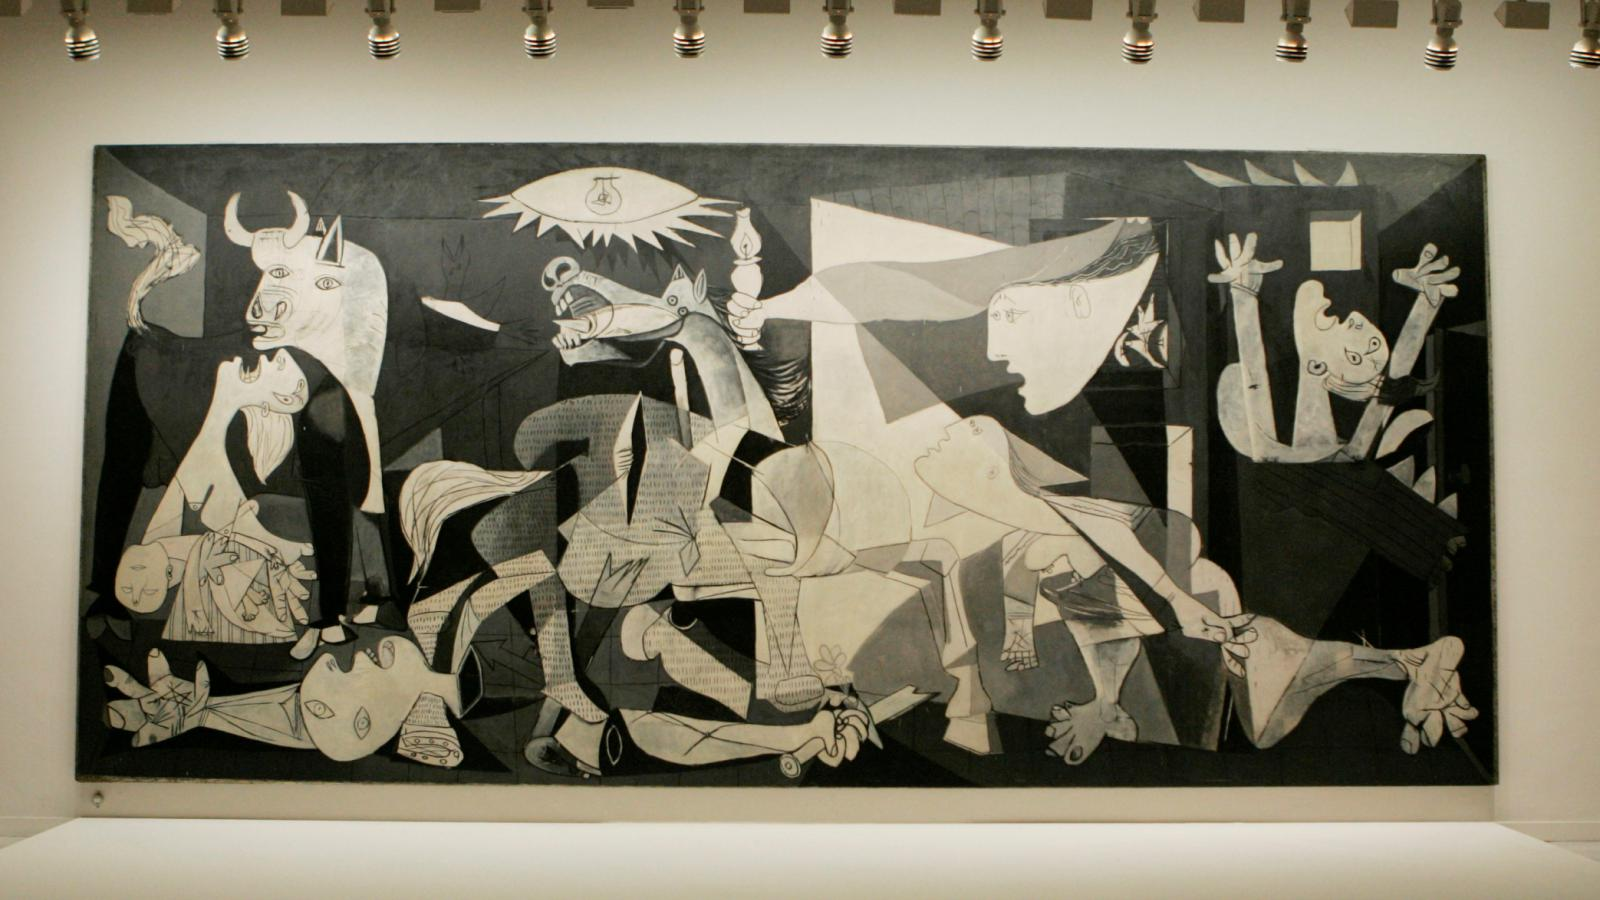 Pablo Picasso / Guernica